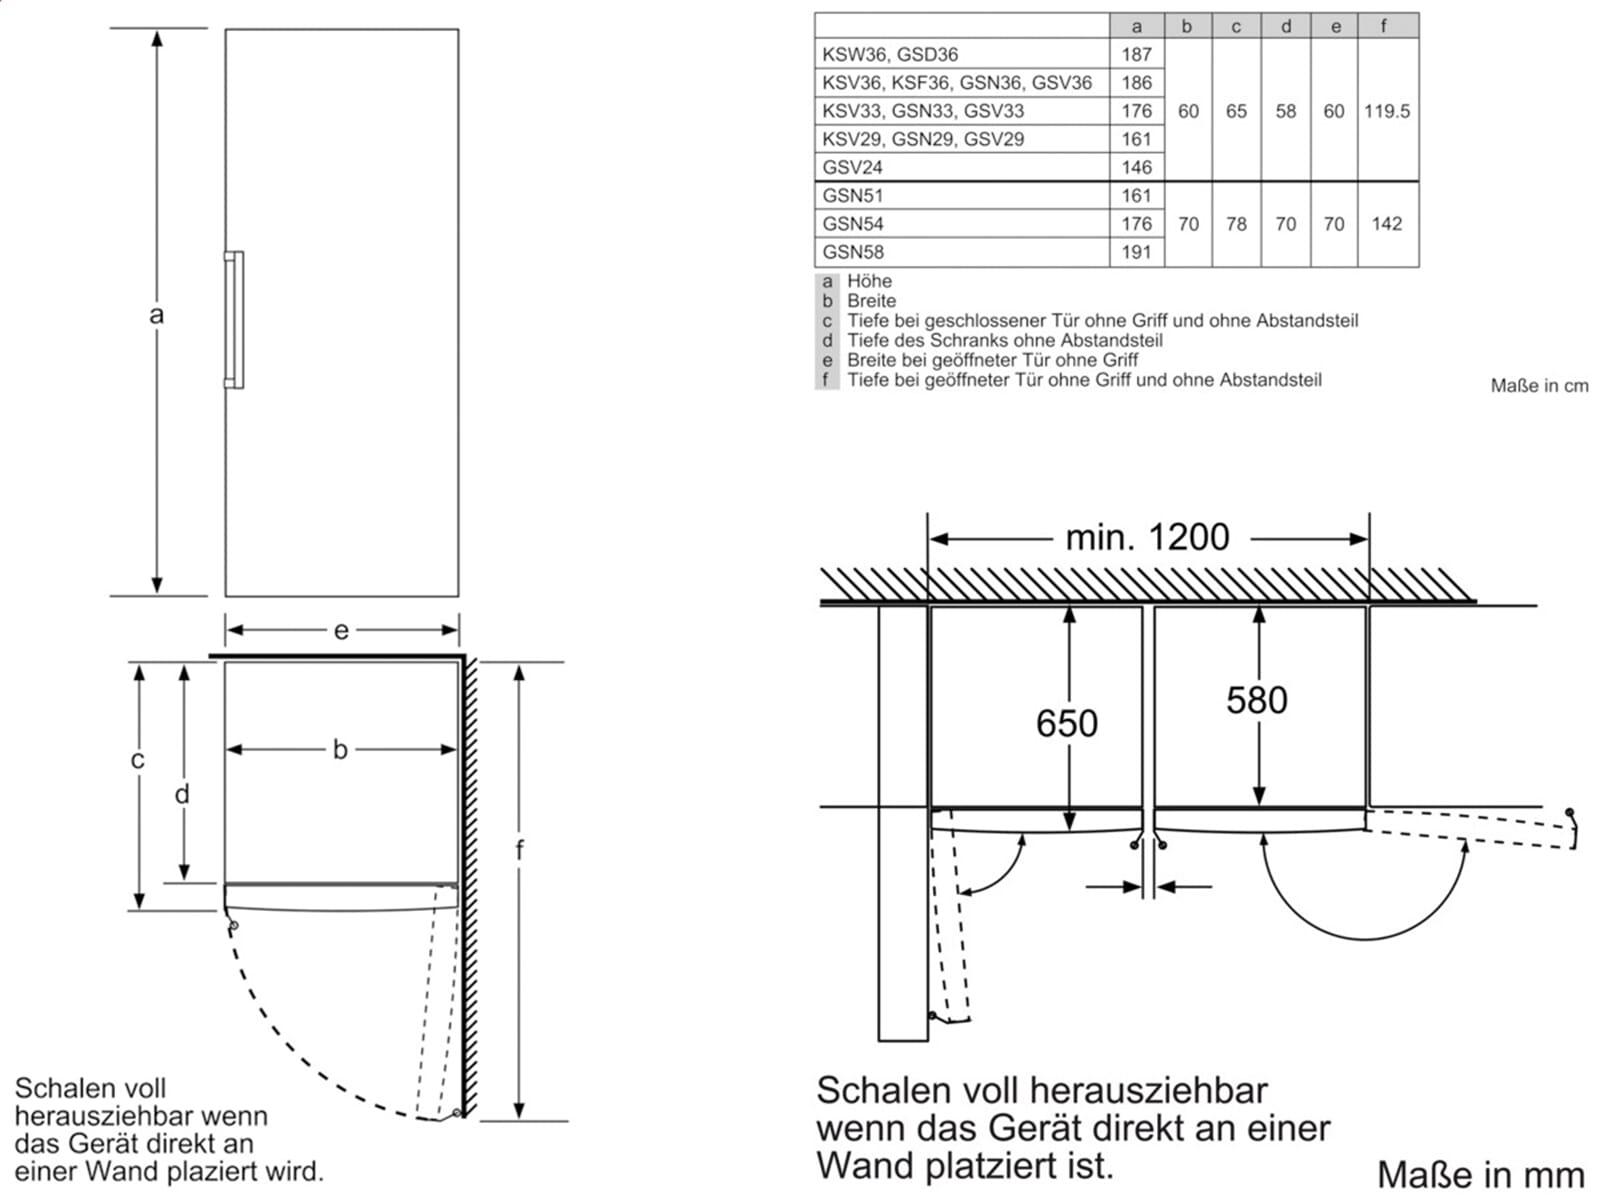 siemens gs36nai31 stand gefrierautomat edelstahl icetwister 186cm memory ebay. Black Bedroom Furniture Sets. Home Design Ideas